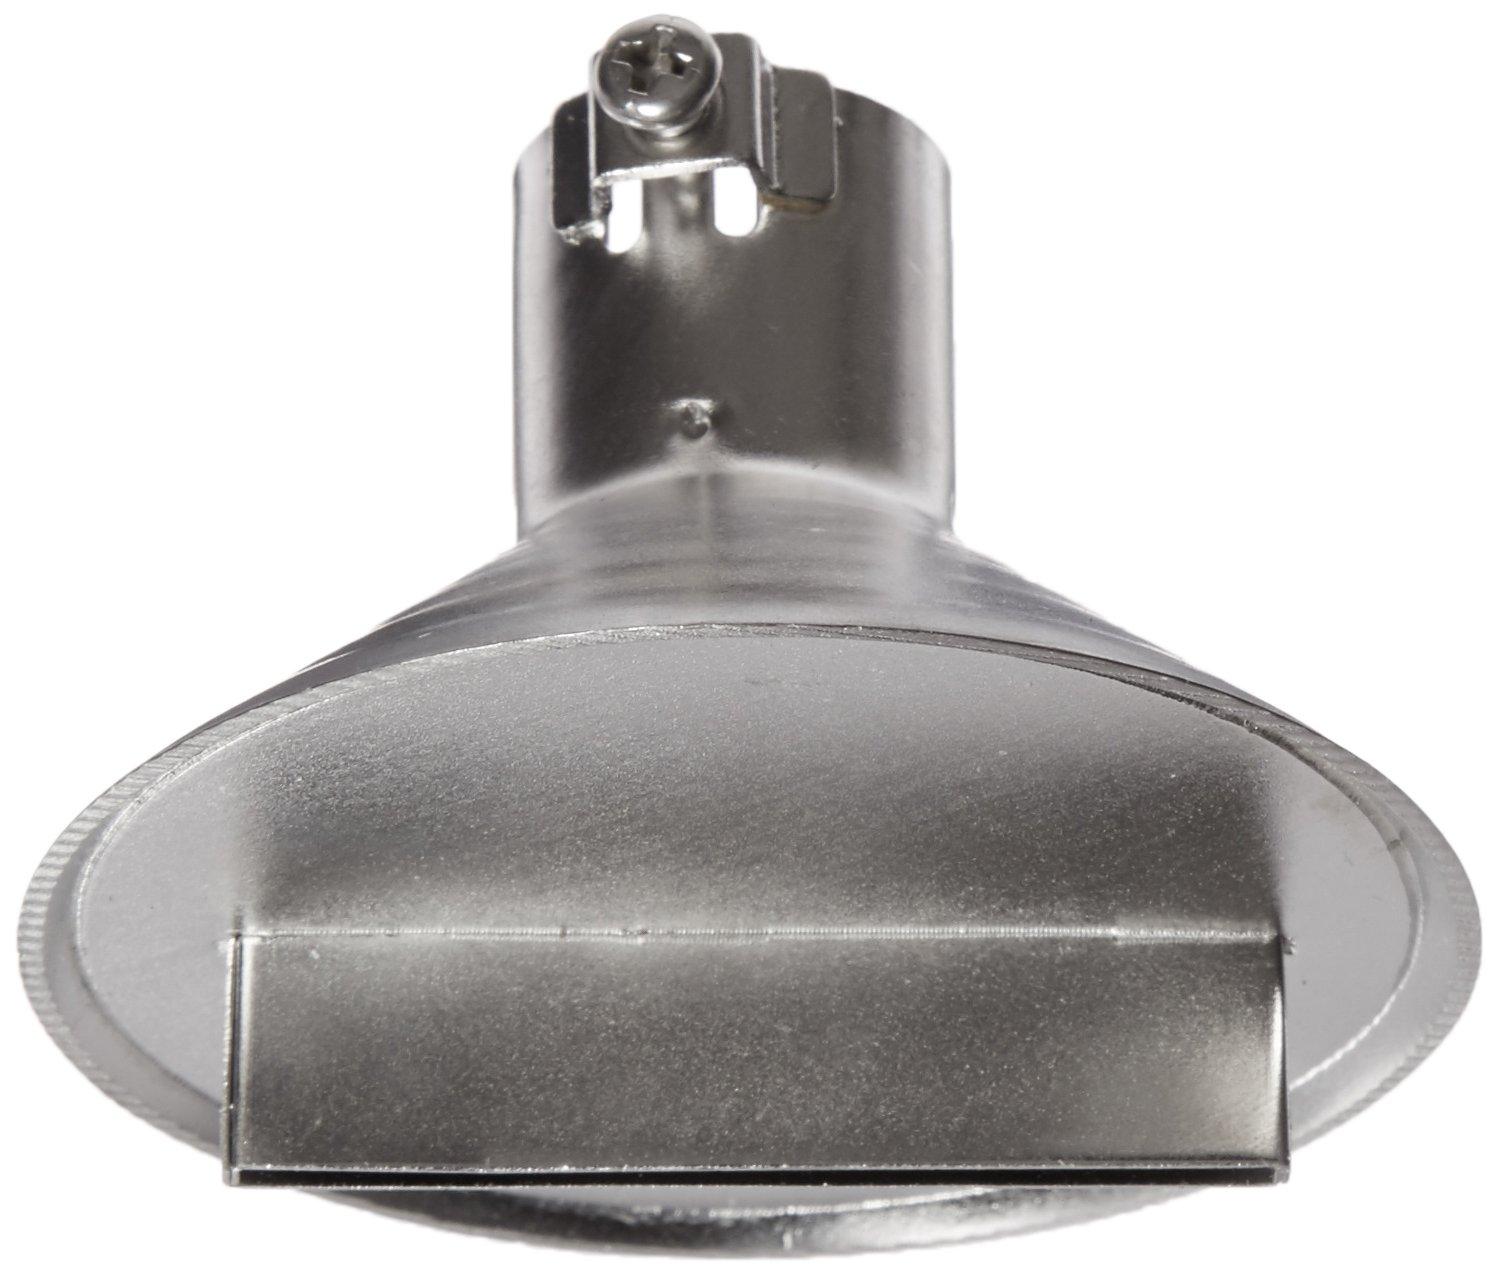 Hot Air Rework Nozzle #1192 SIP 50mm Long